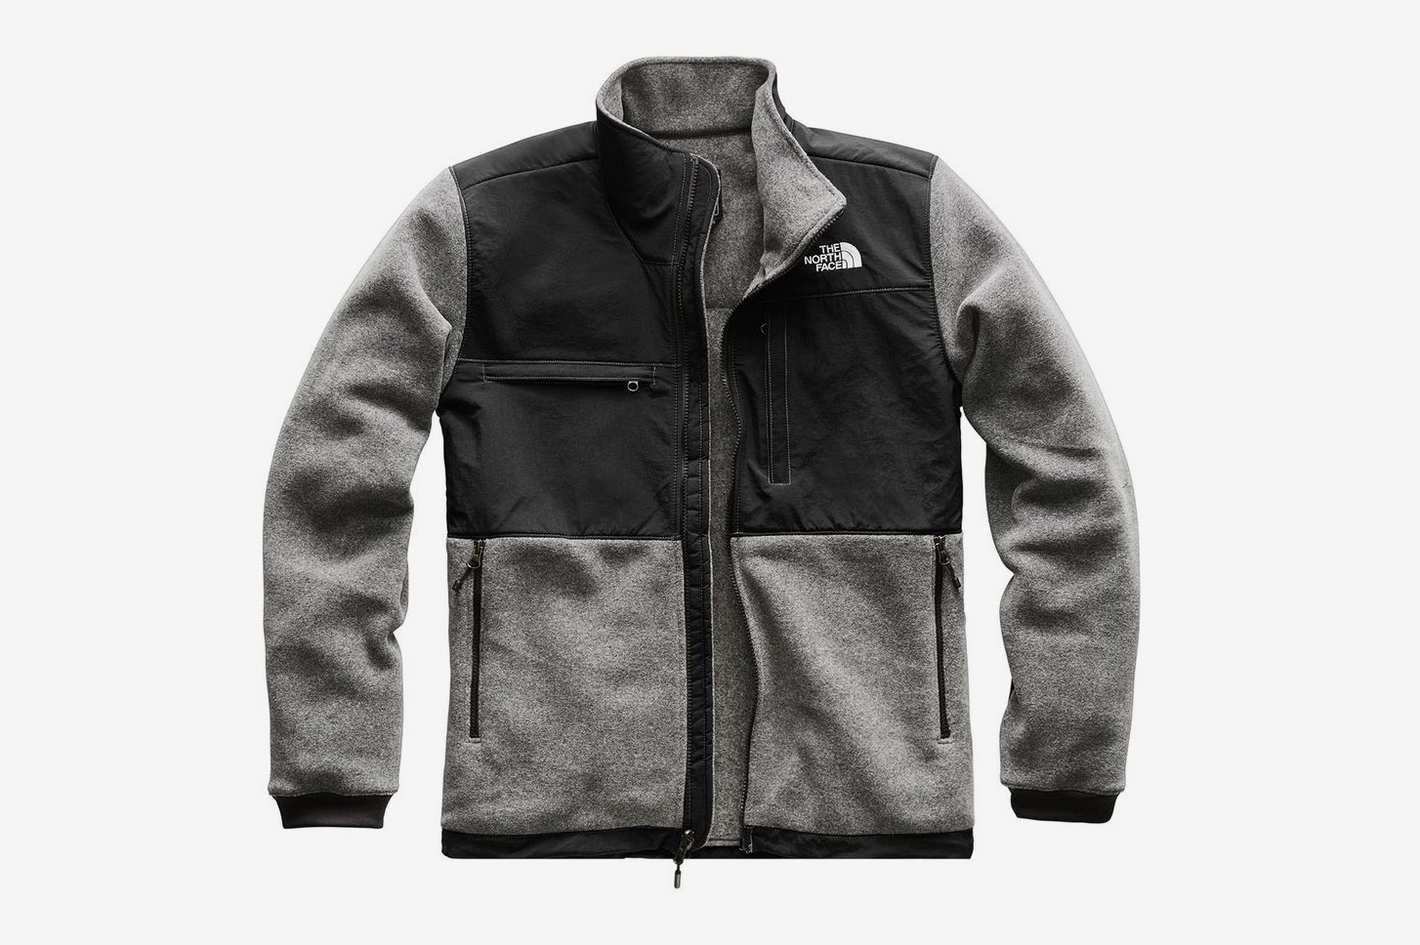 The North Face Men's Denali 2 Fleece Jacket